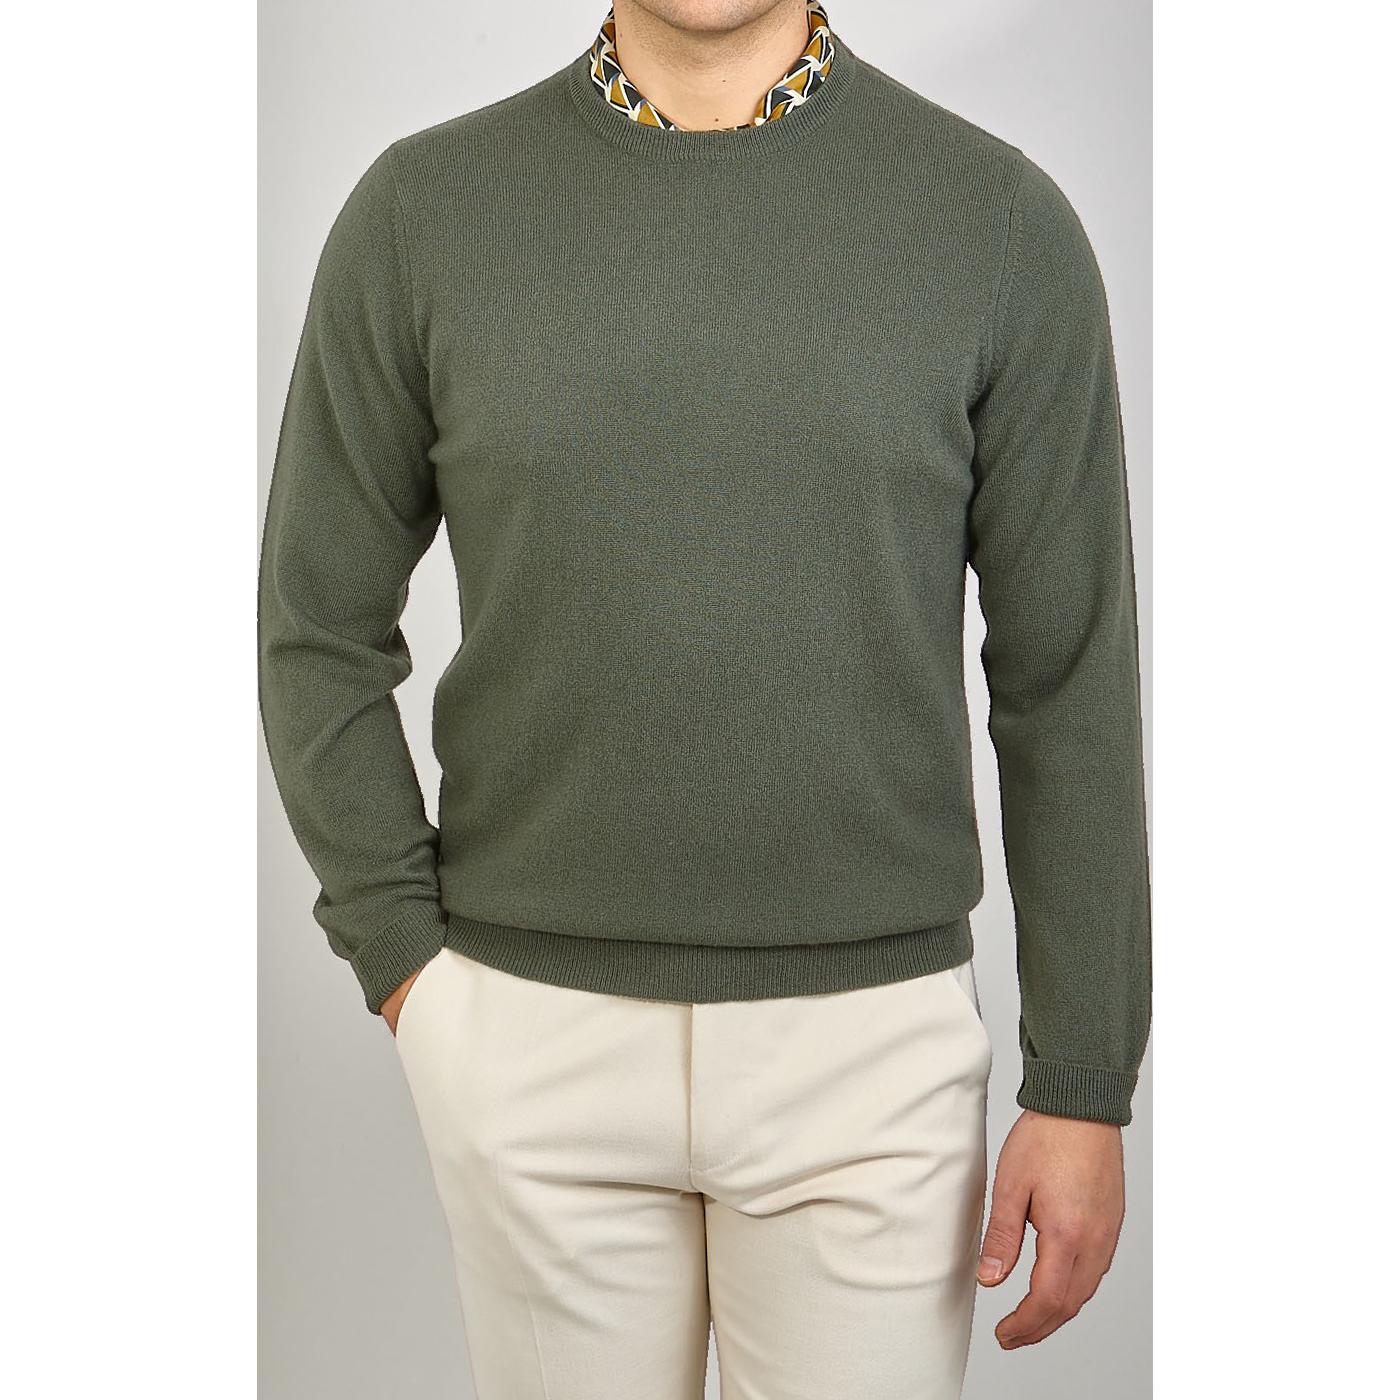 Davida Army Green Cashmere Crewneck Sweater Front